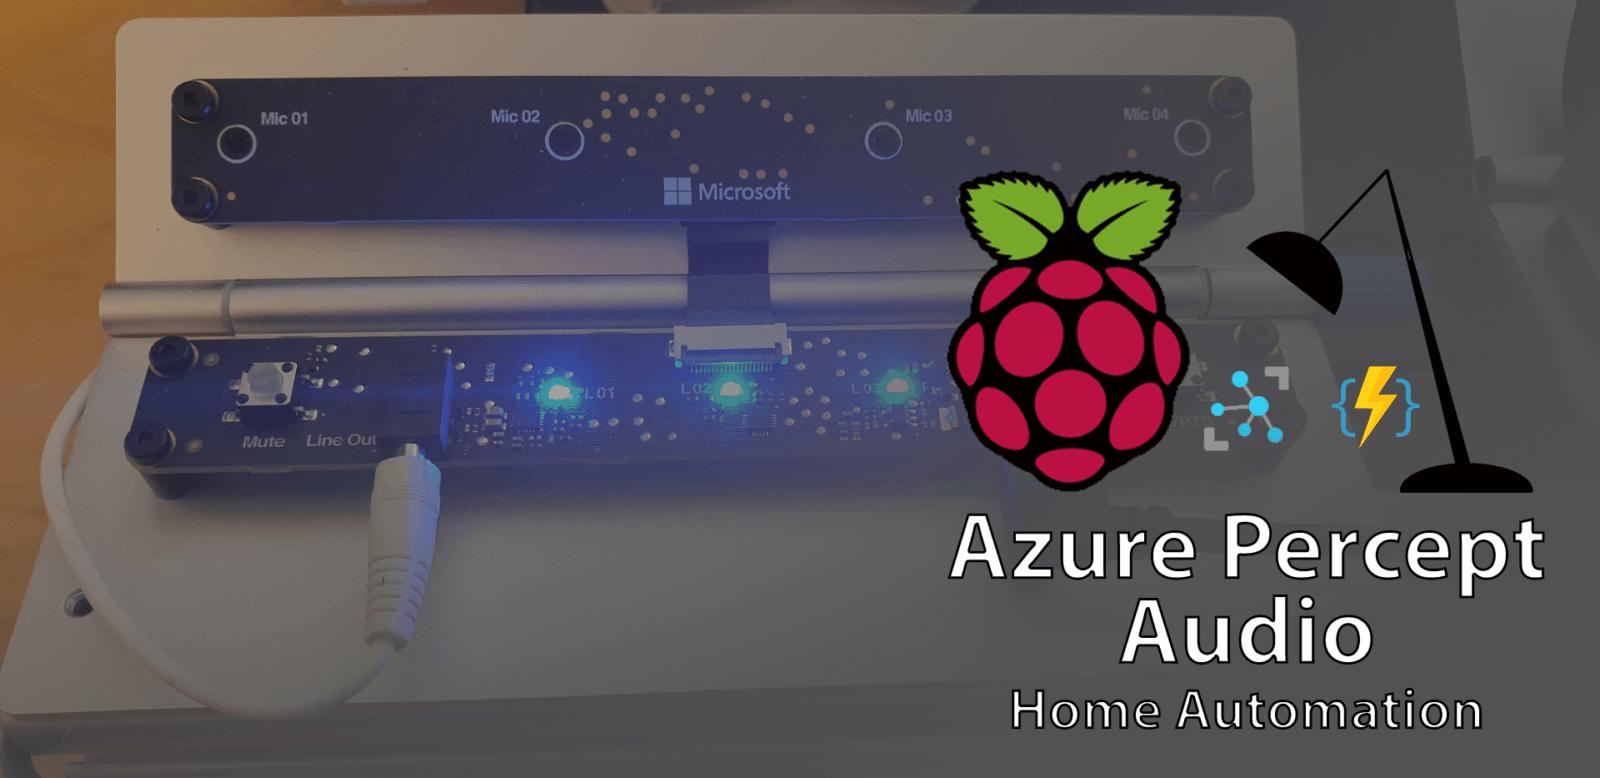 Azure Percept Audio - Home Automation